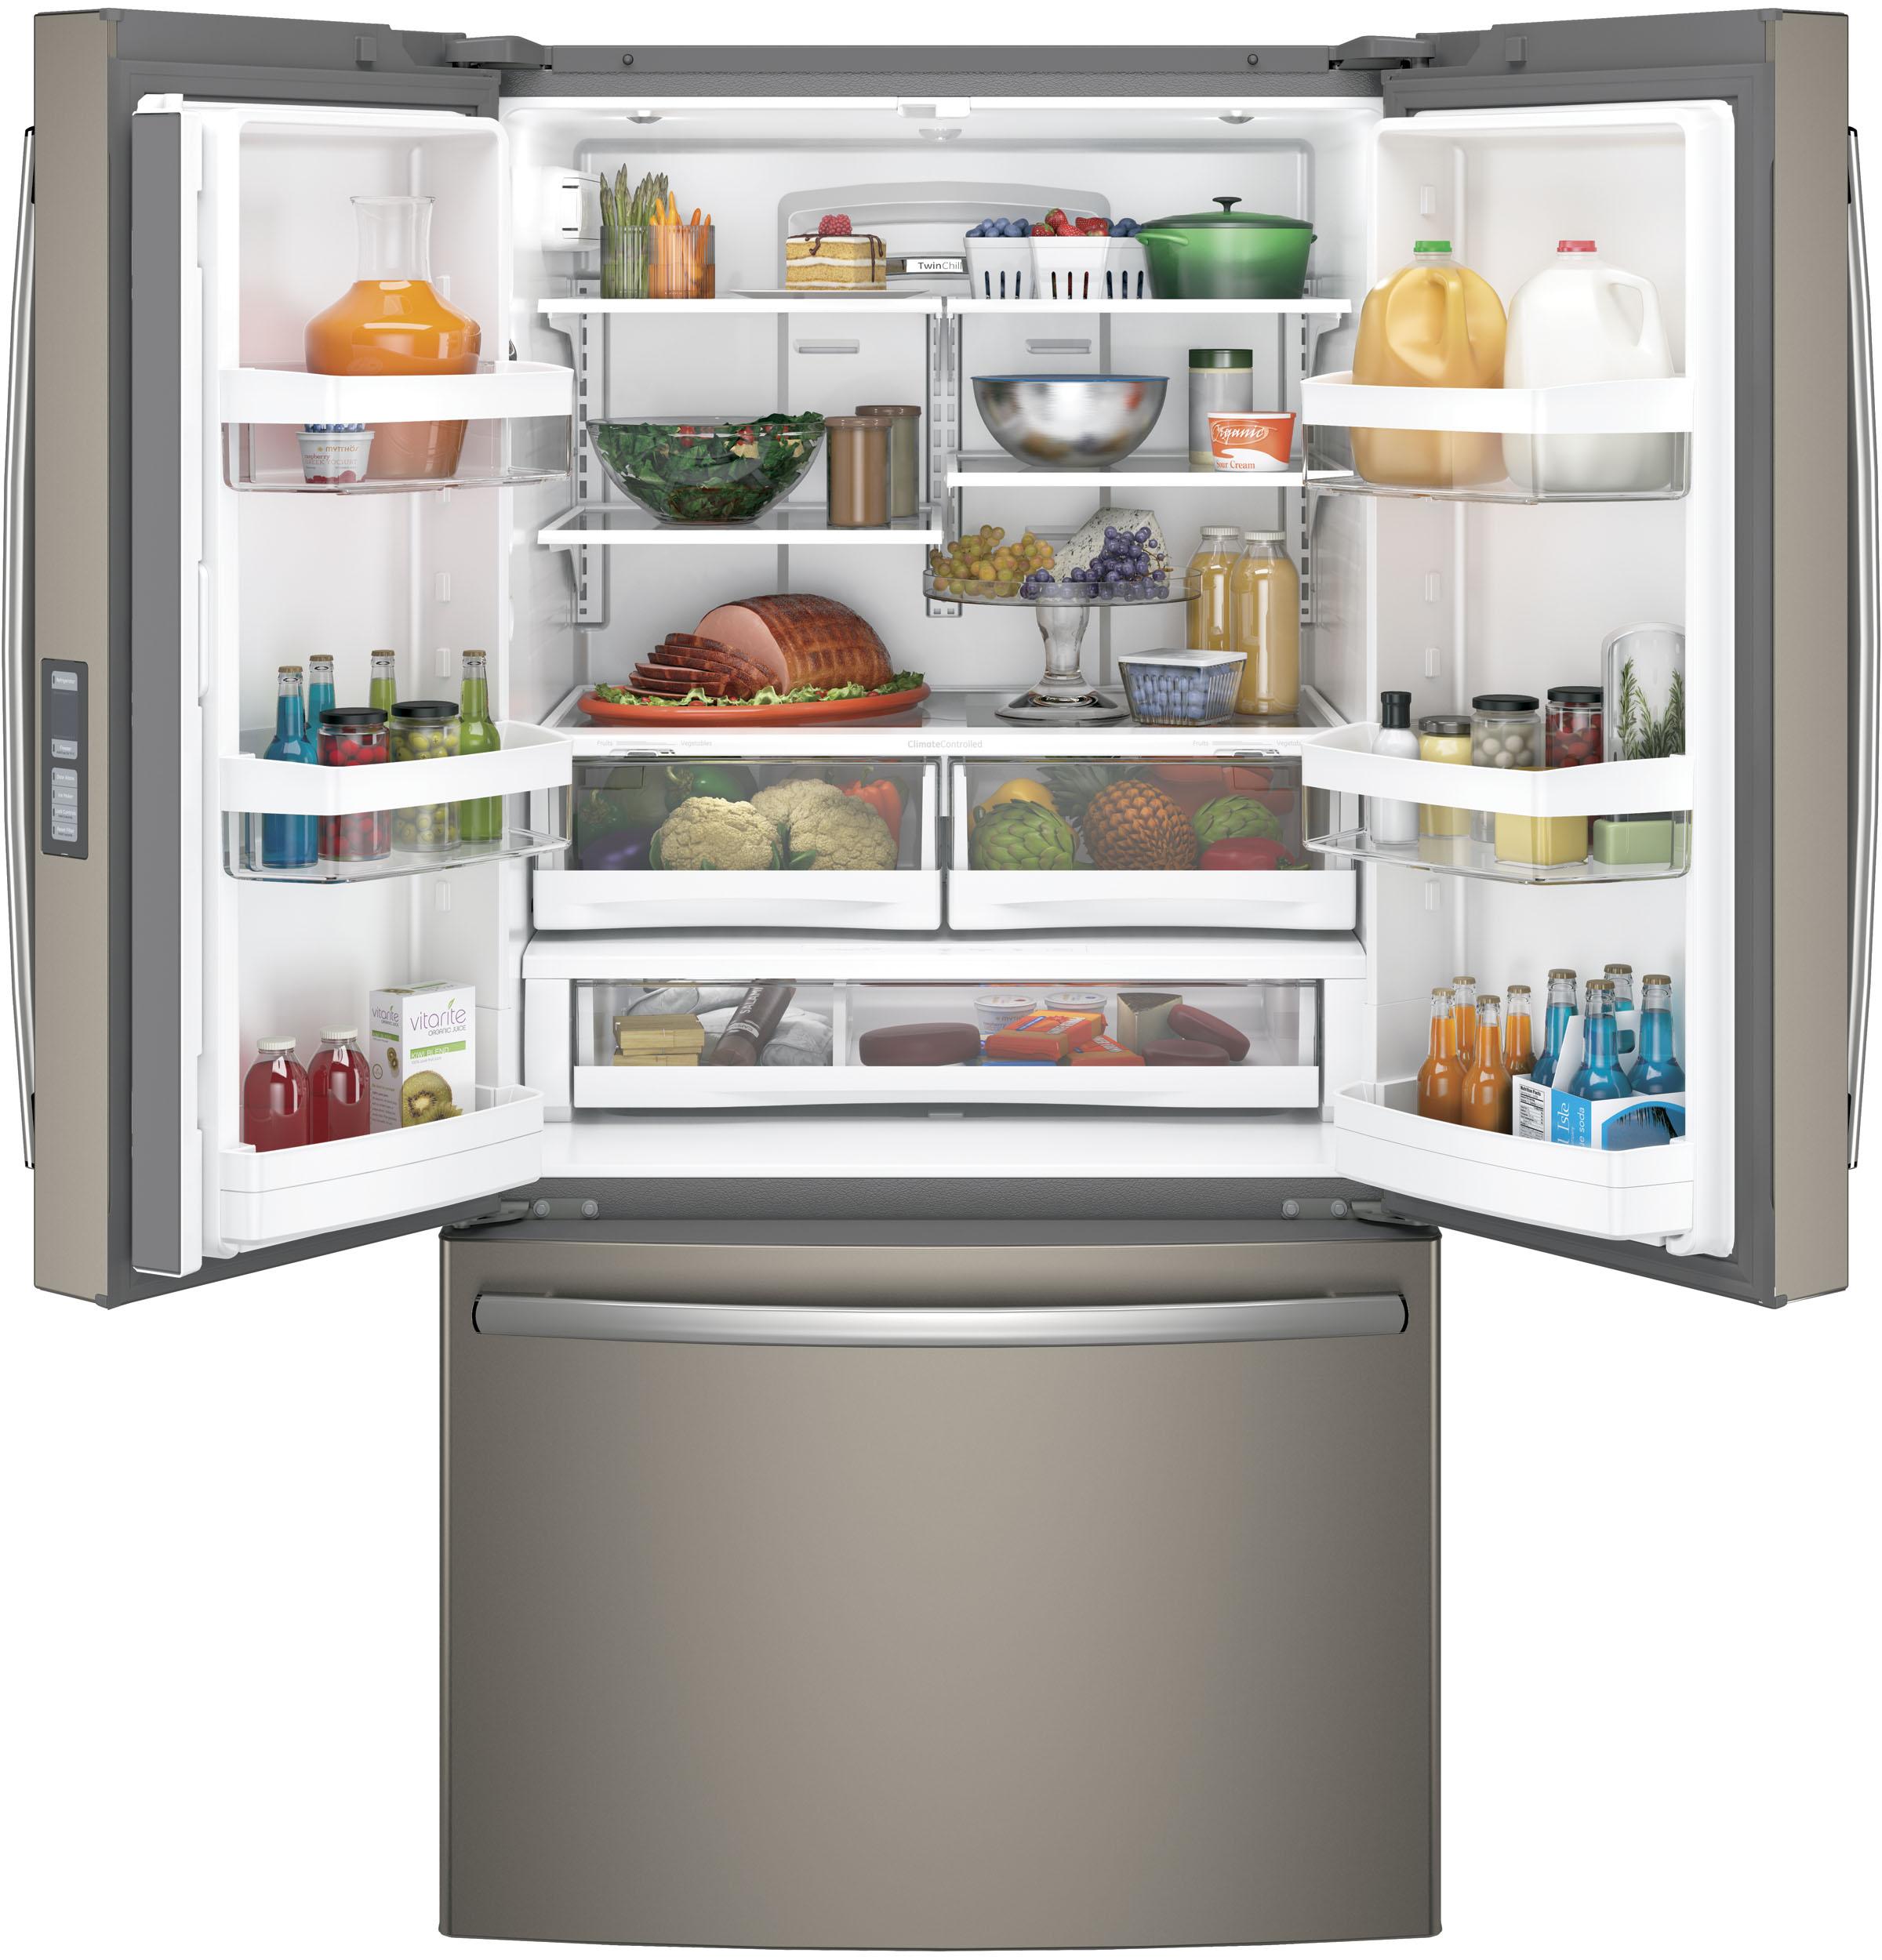 Model: GNE29GMKES | GE® ENERGY STAR® 28.7 Cu. Ft. French-Door Refrigerator